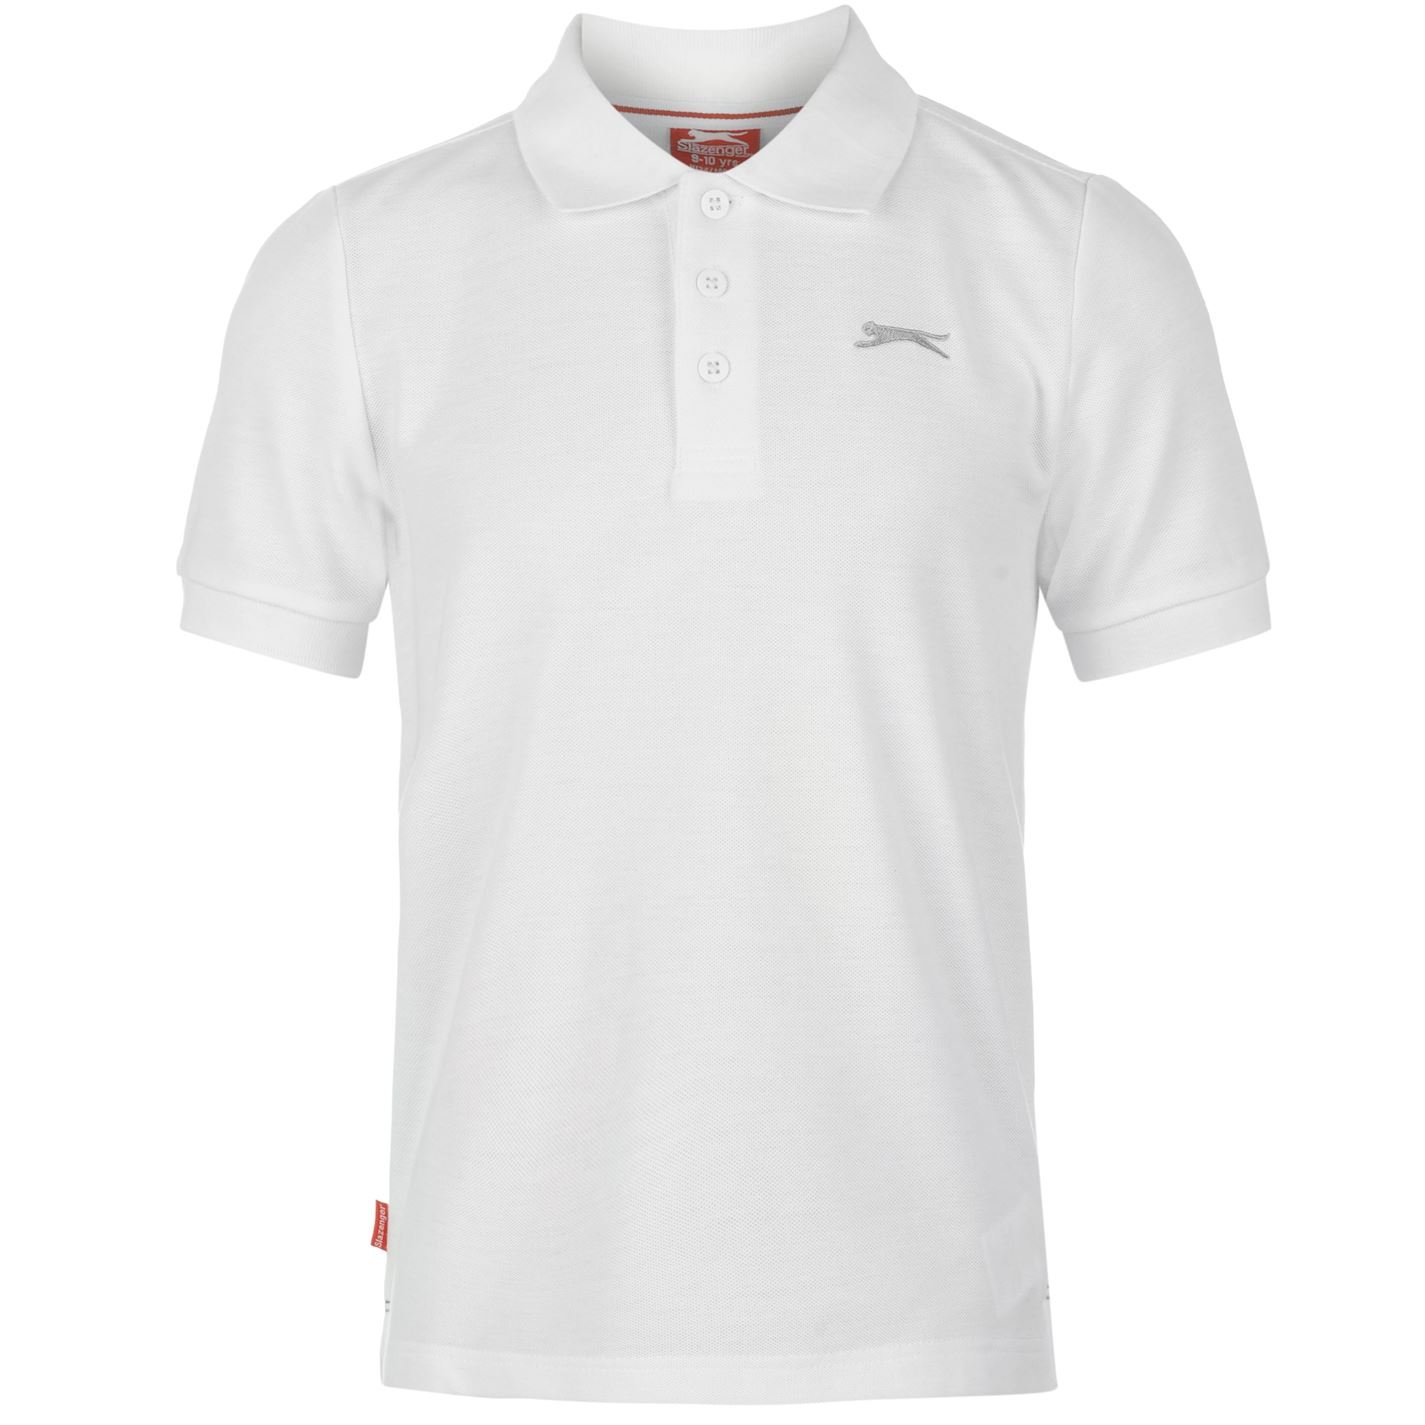 Slazenger Kids Junior Boys Plain Polo Short Sleeve T Shirt Tee Top Clothing